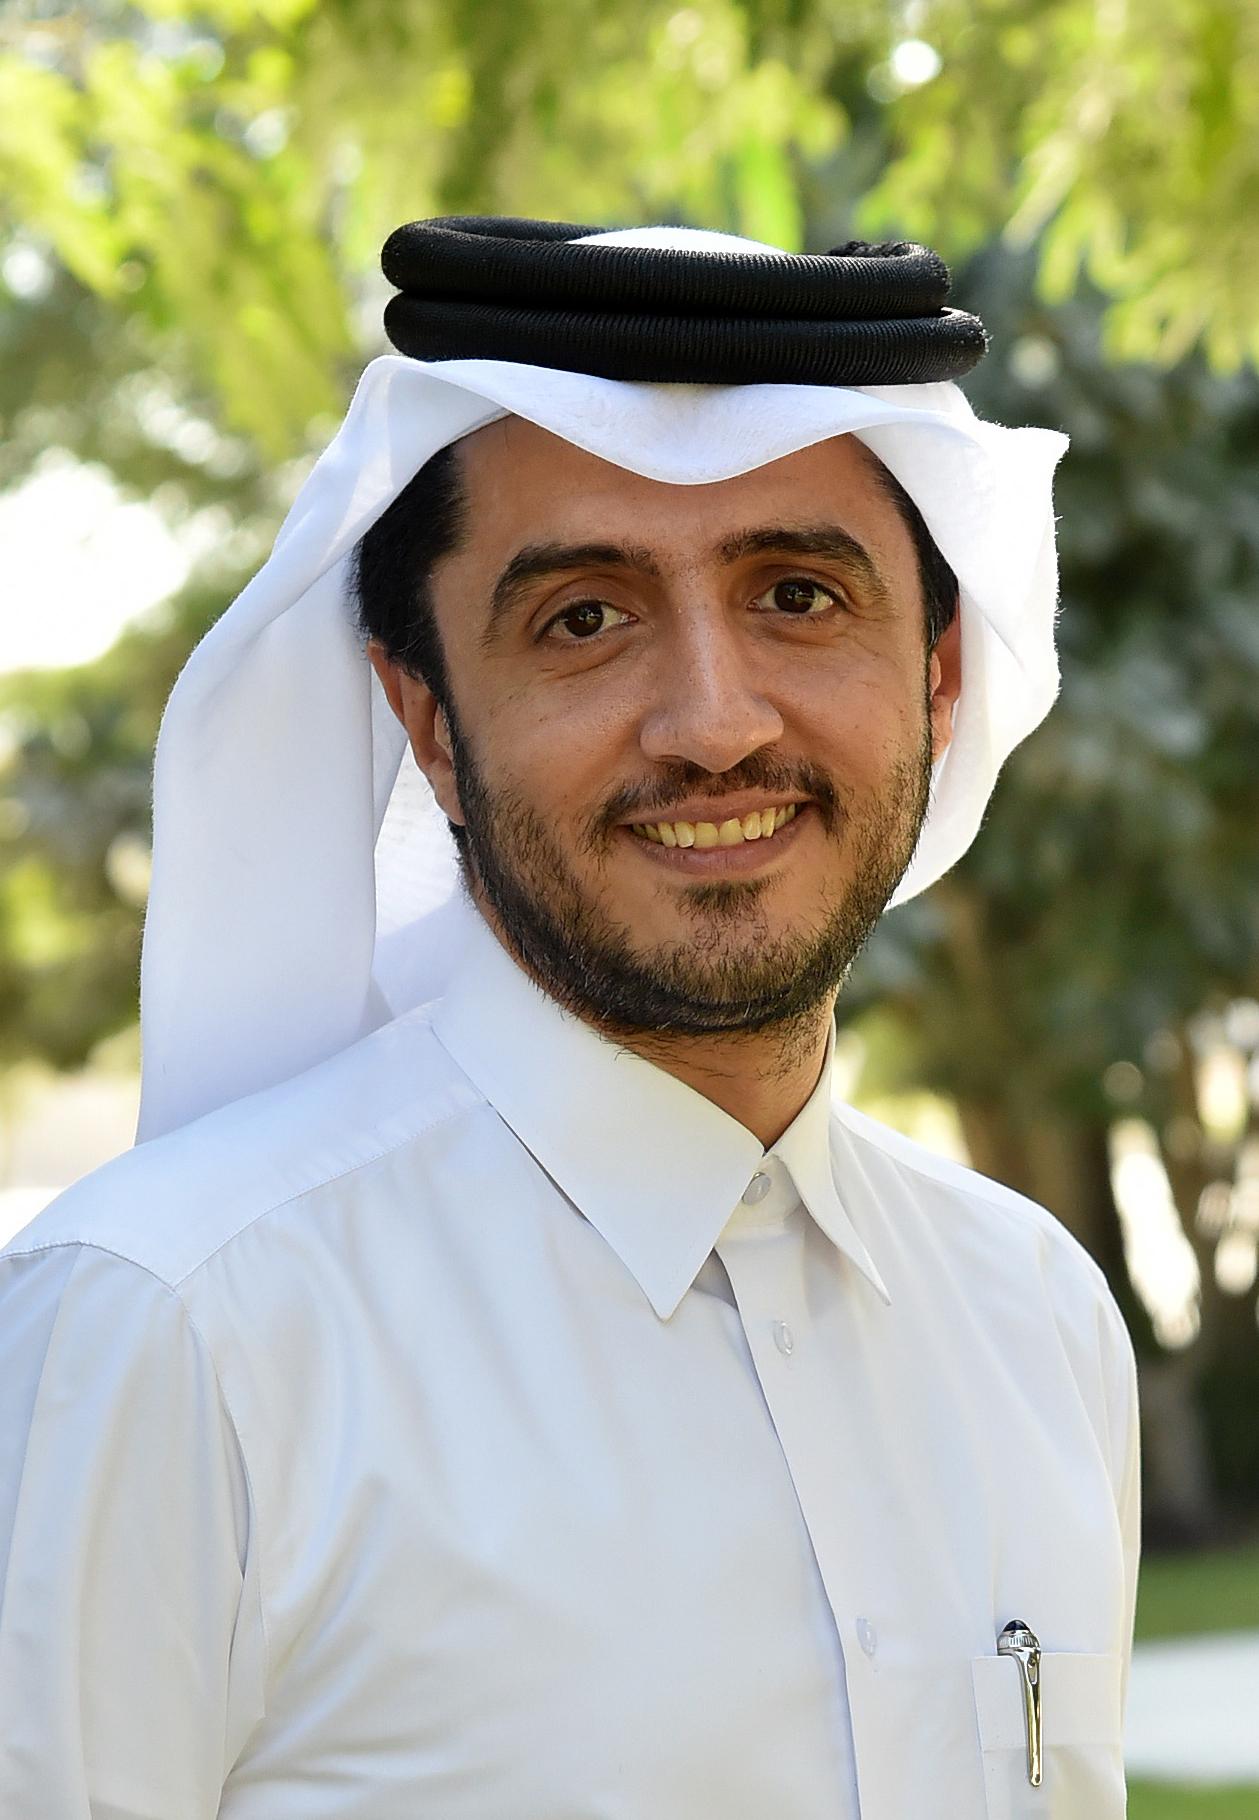 http://www.qu.edu.qa/static_file/qu/colleges/engineering/departments/cse/images/Abdulla_Khalid.jpg